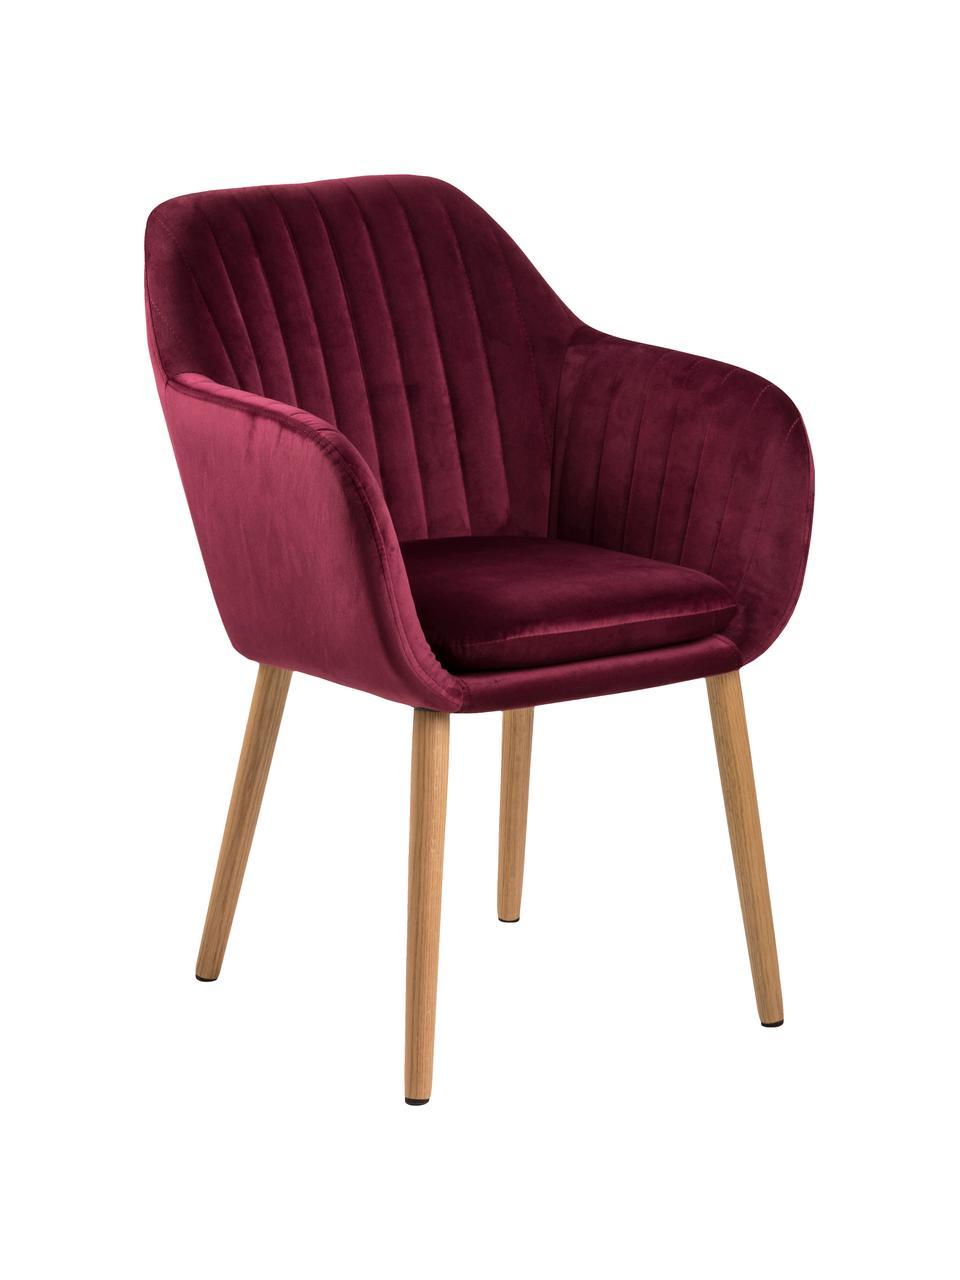 Sametová židle spodručkami Emilia, Bordó